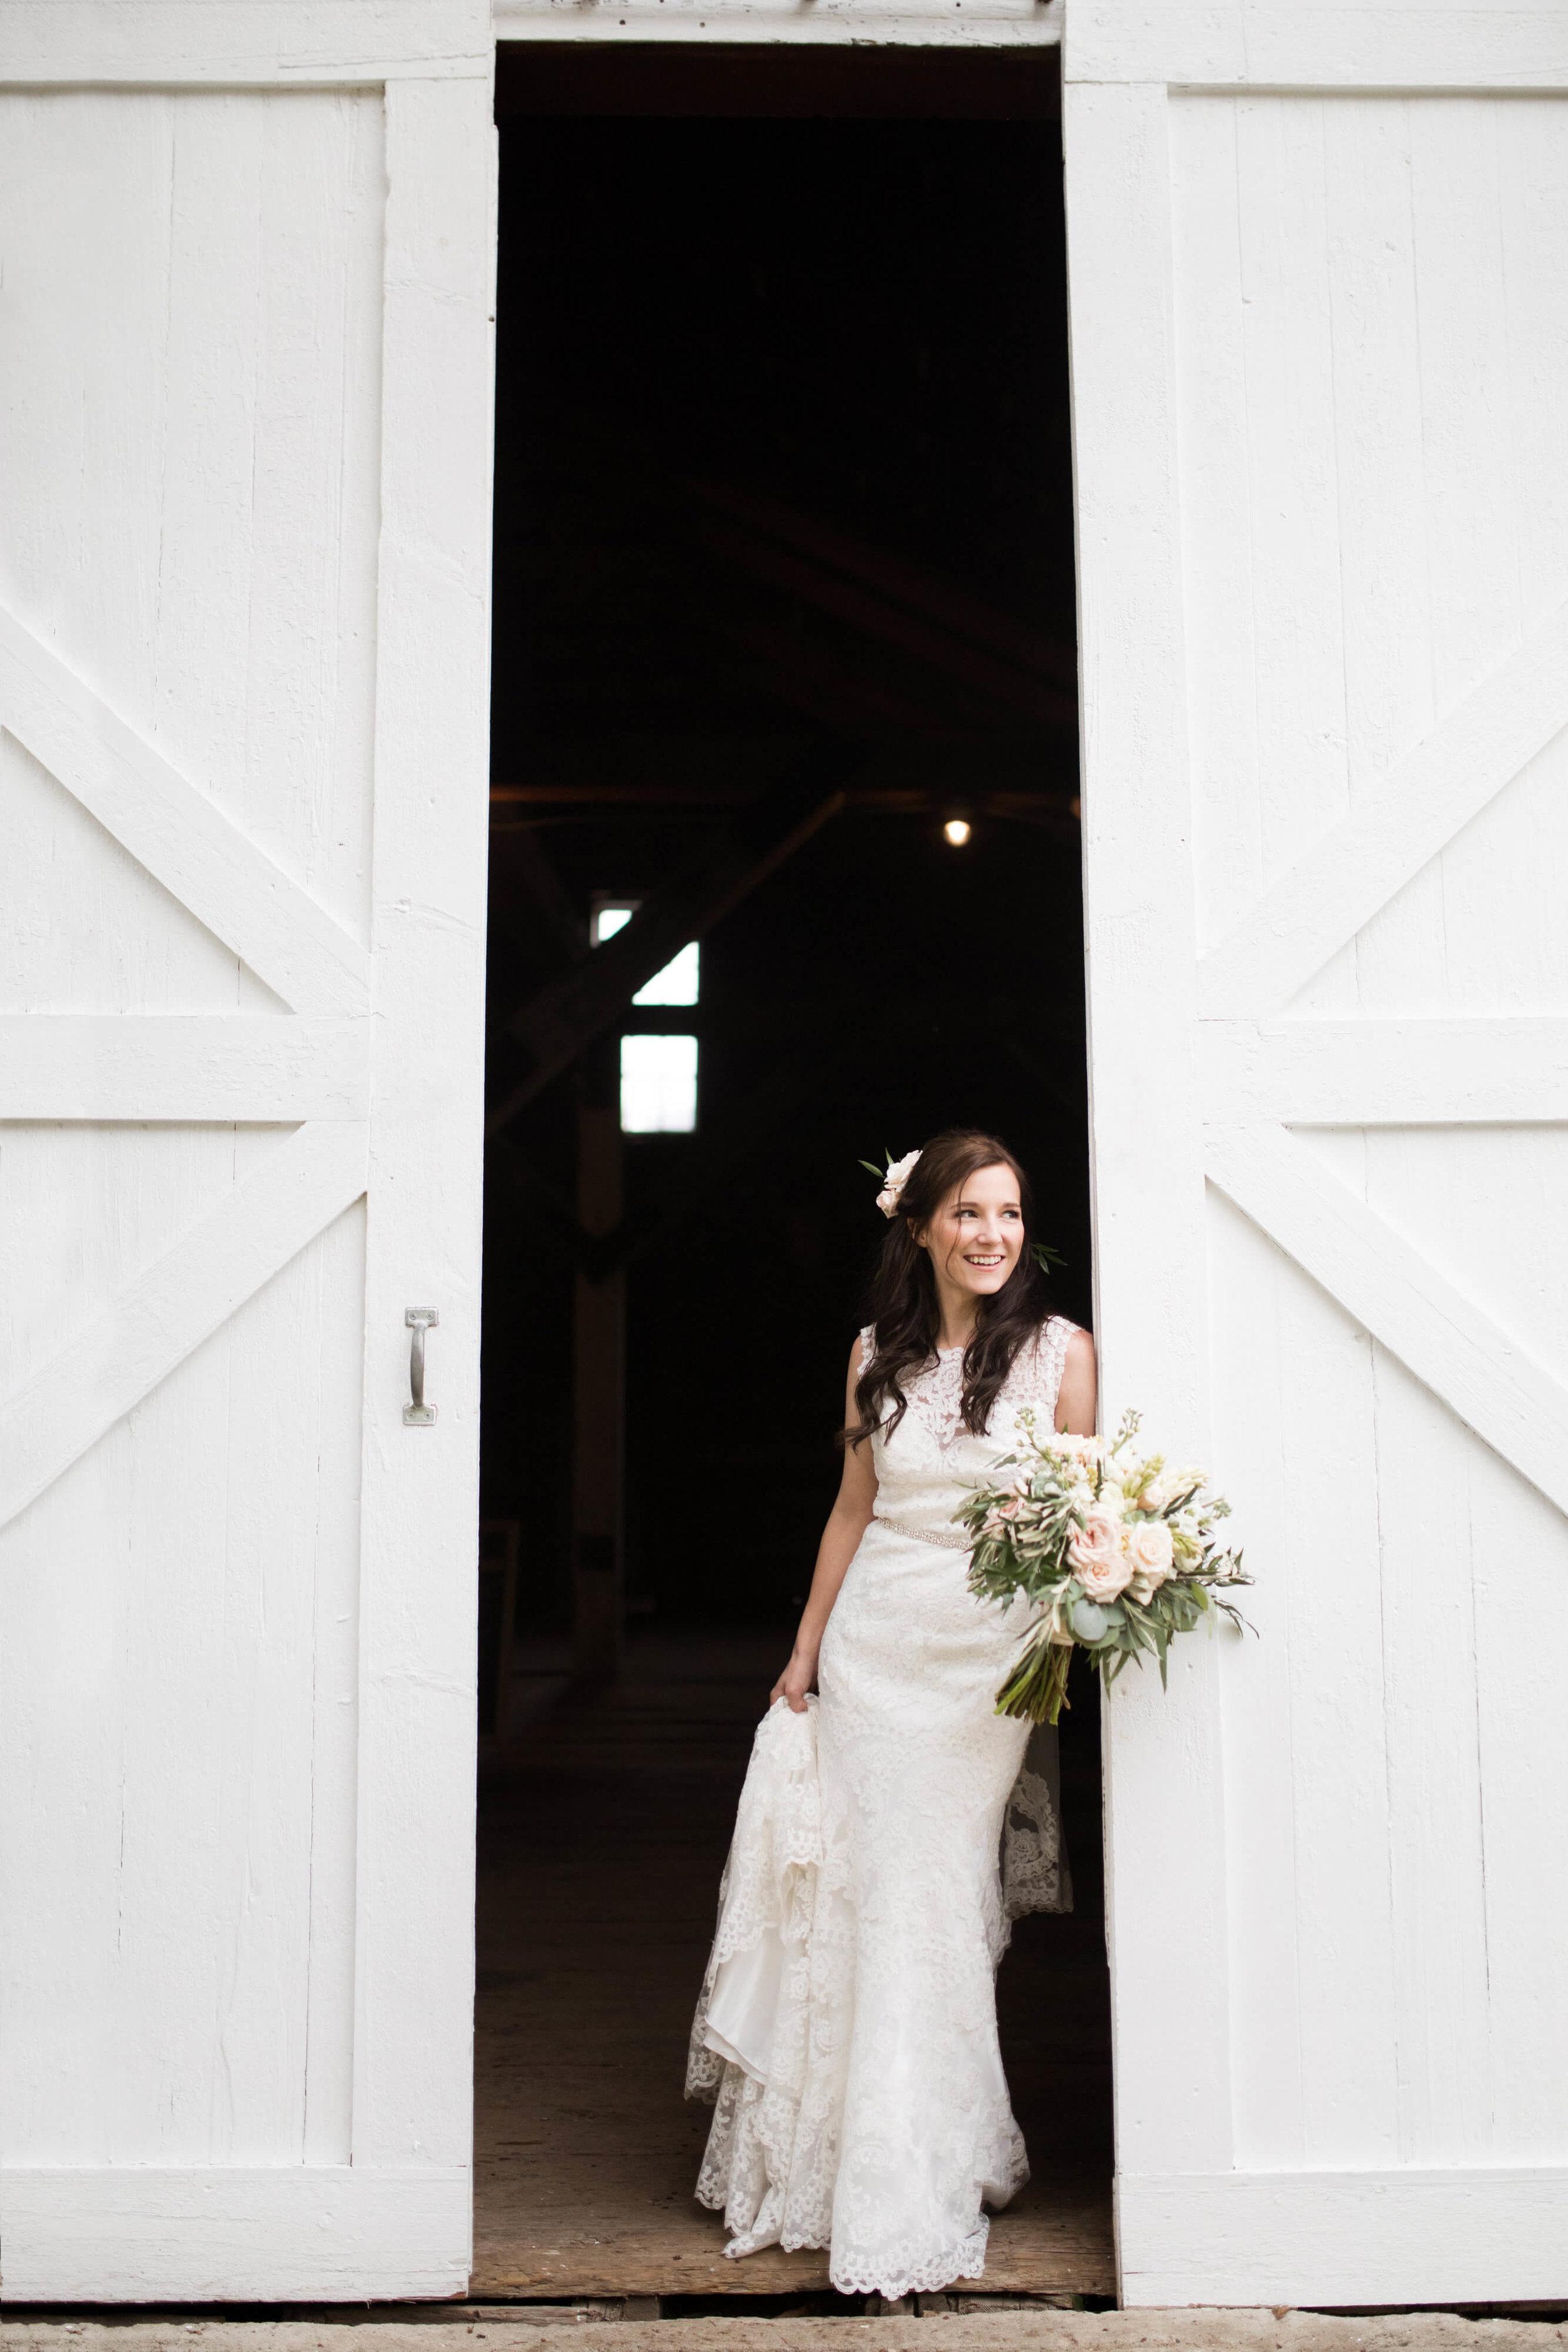 bride standing in the barn doors | Minnesota wedding photographer Studio KH wedding dress details | wedding blog | Sixpence Events 70 Ways to Photograph Your Wedding Dress.jpg